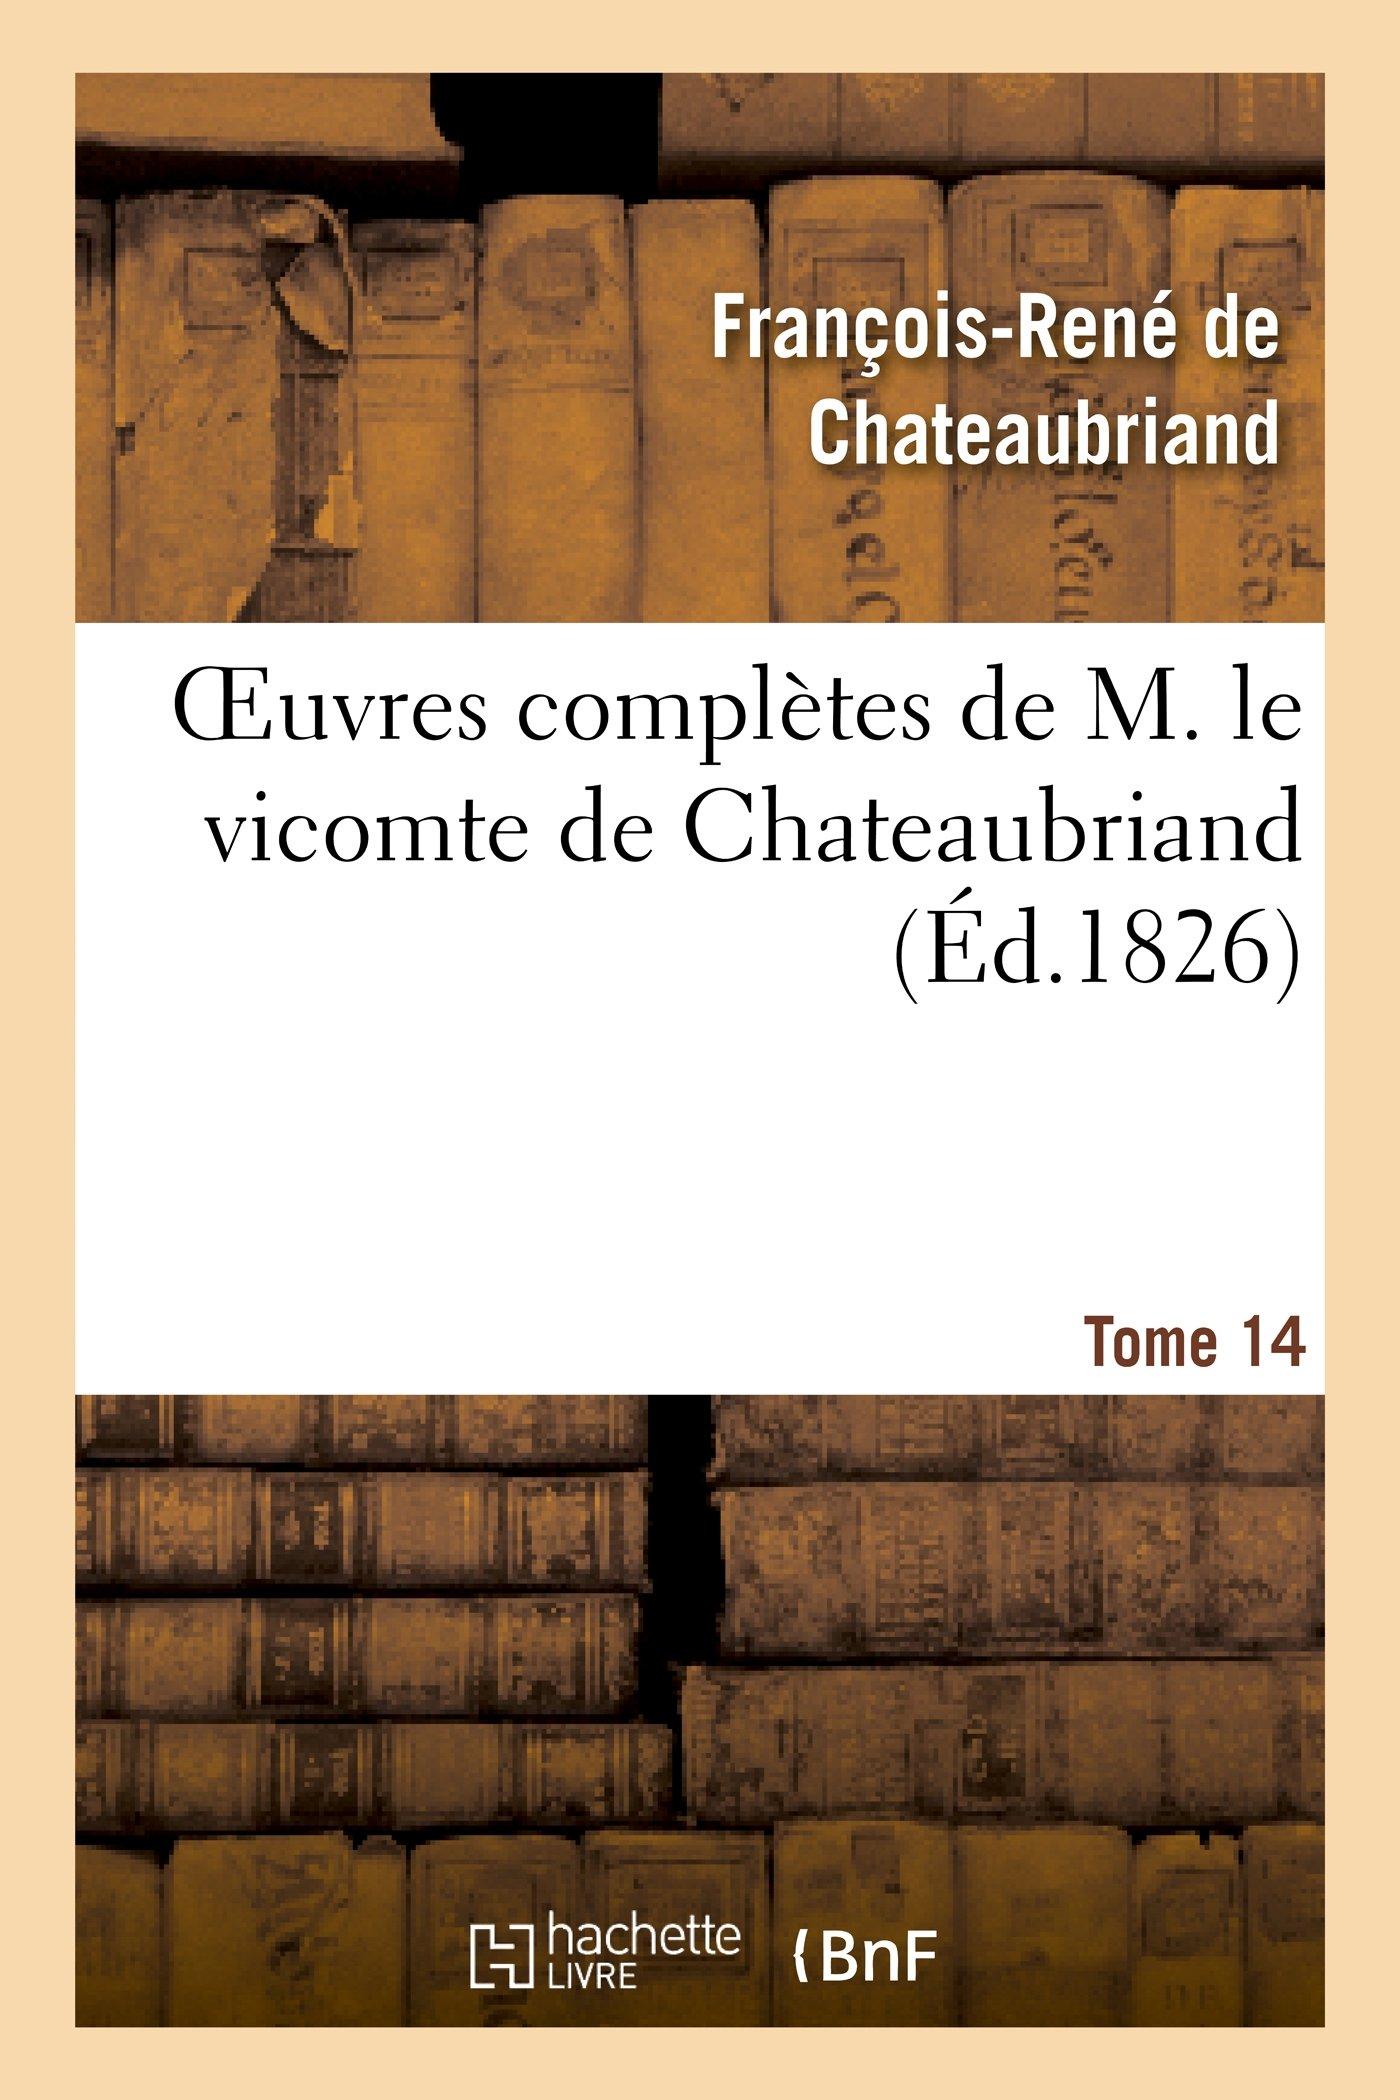 Oeuvres Completes de M. Le Vicomte de Chateaubriand, Tome 14 (Litterature) (French Edition) pdf epub